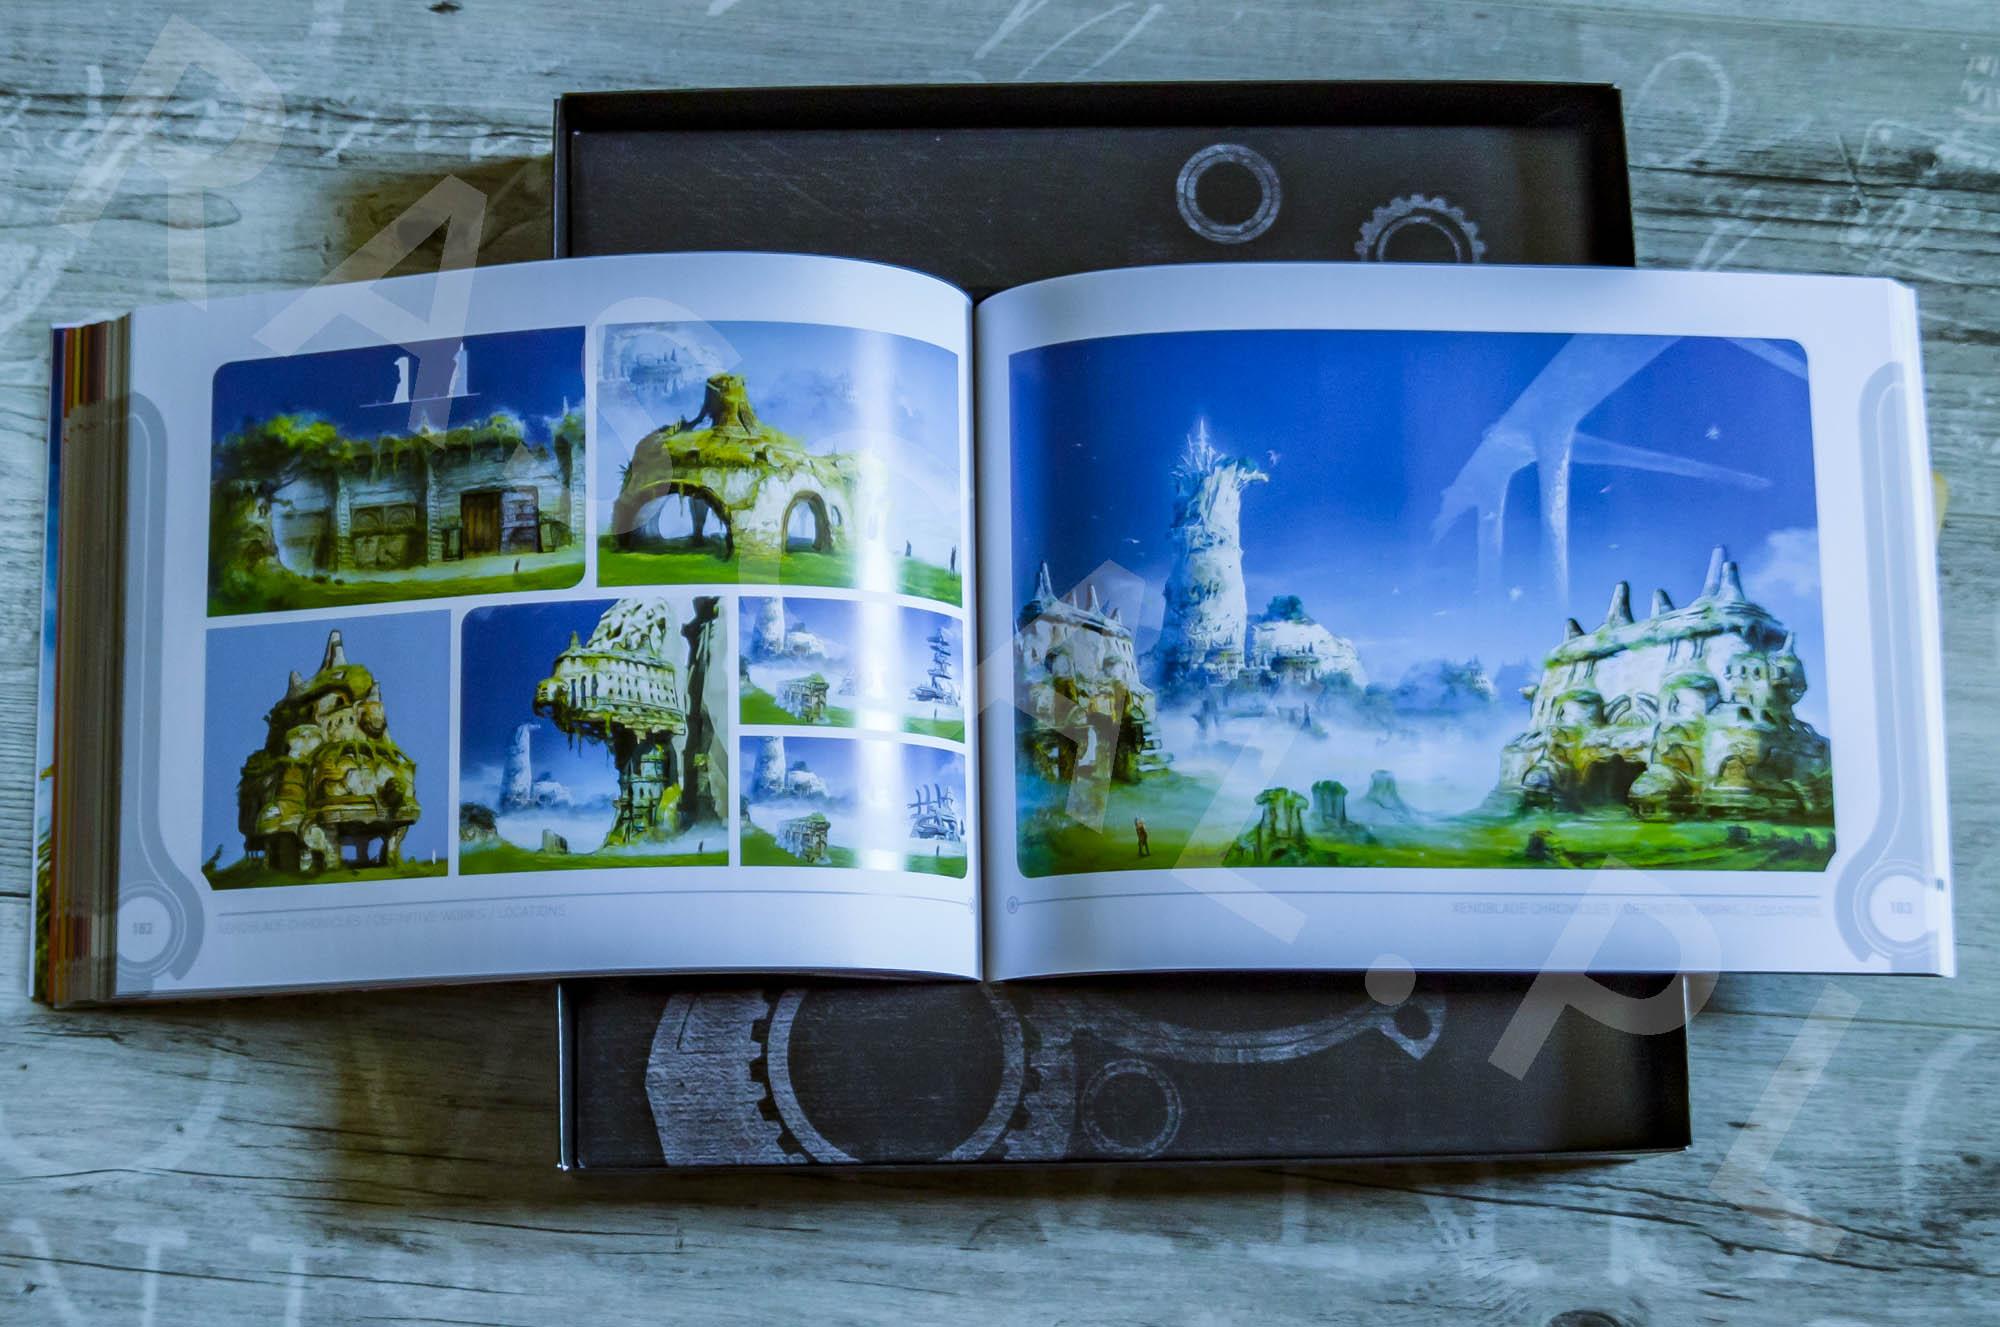 Xenoblade Chronicles Definitive Edition Collectors Set - Artbook - 22 - Lokacje